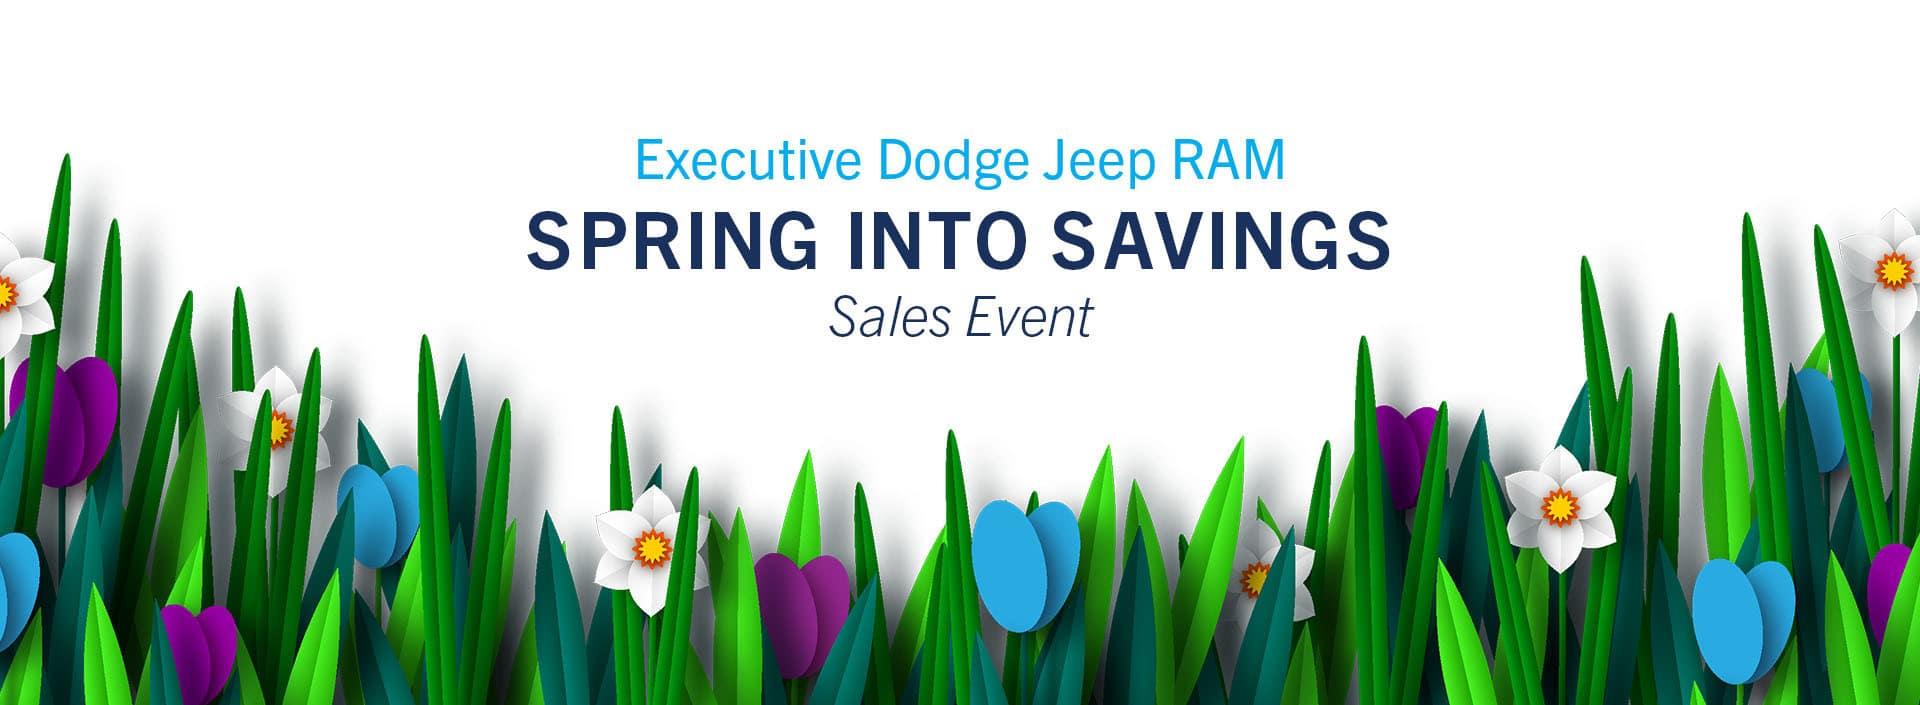 EAG_DJR_Spring-into-Savings